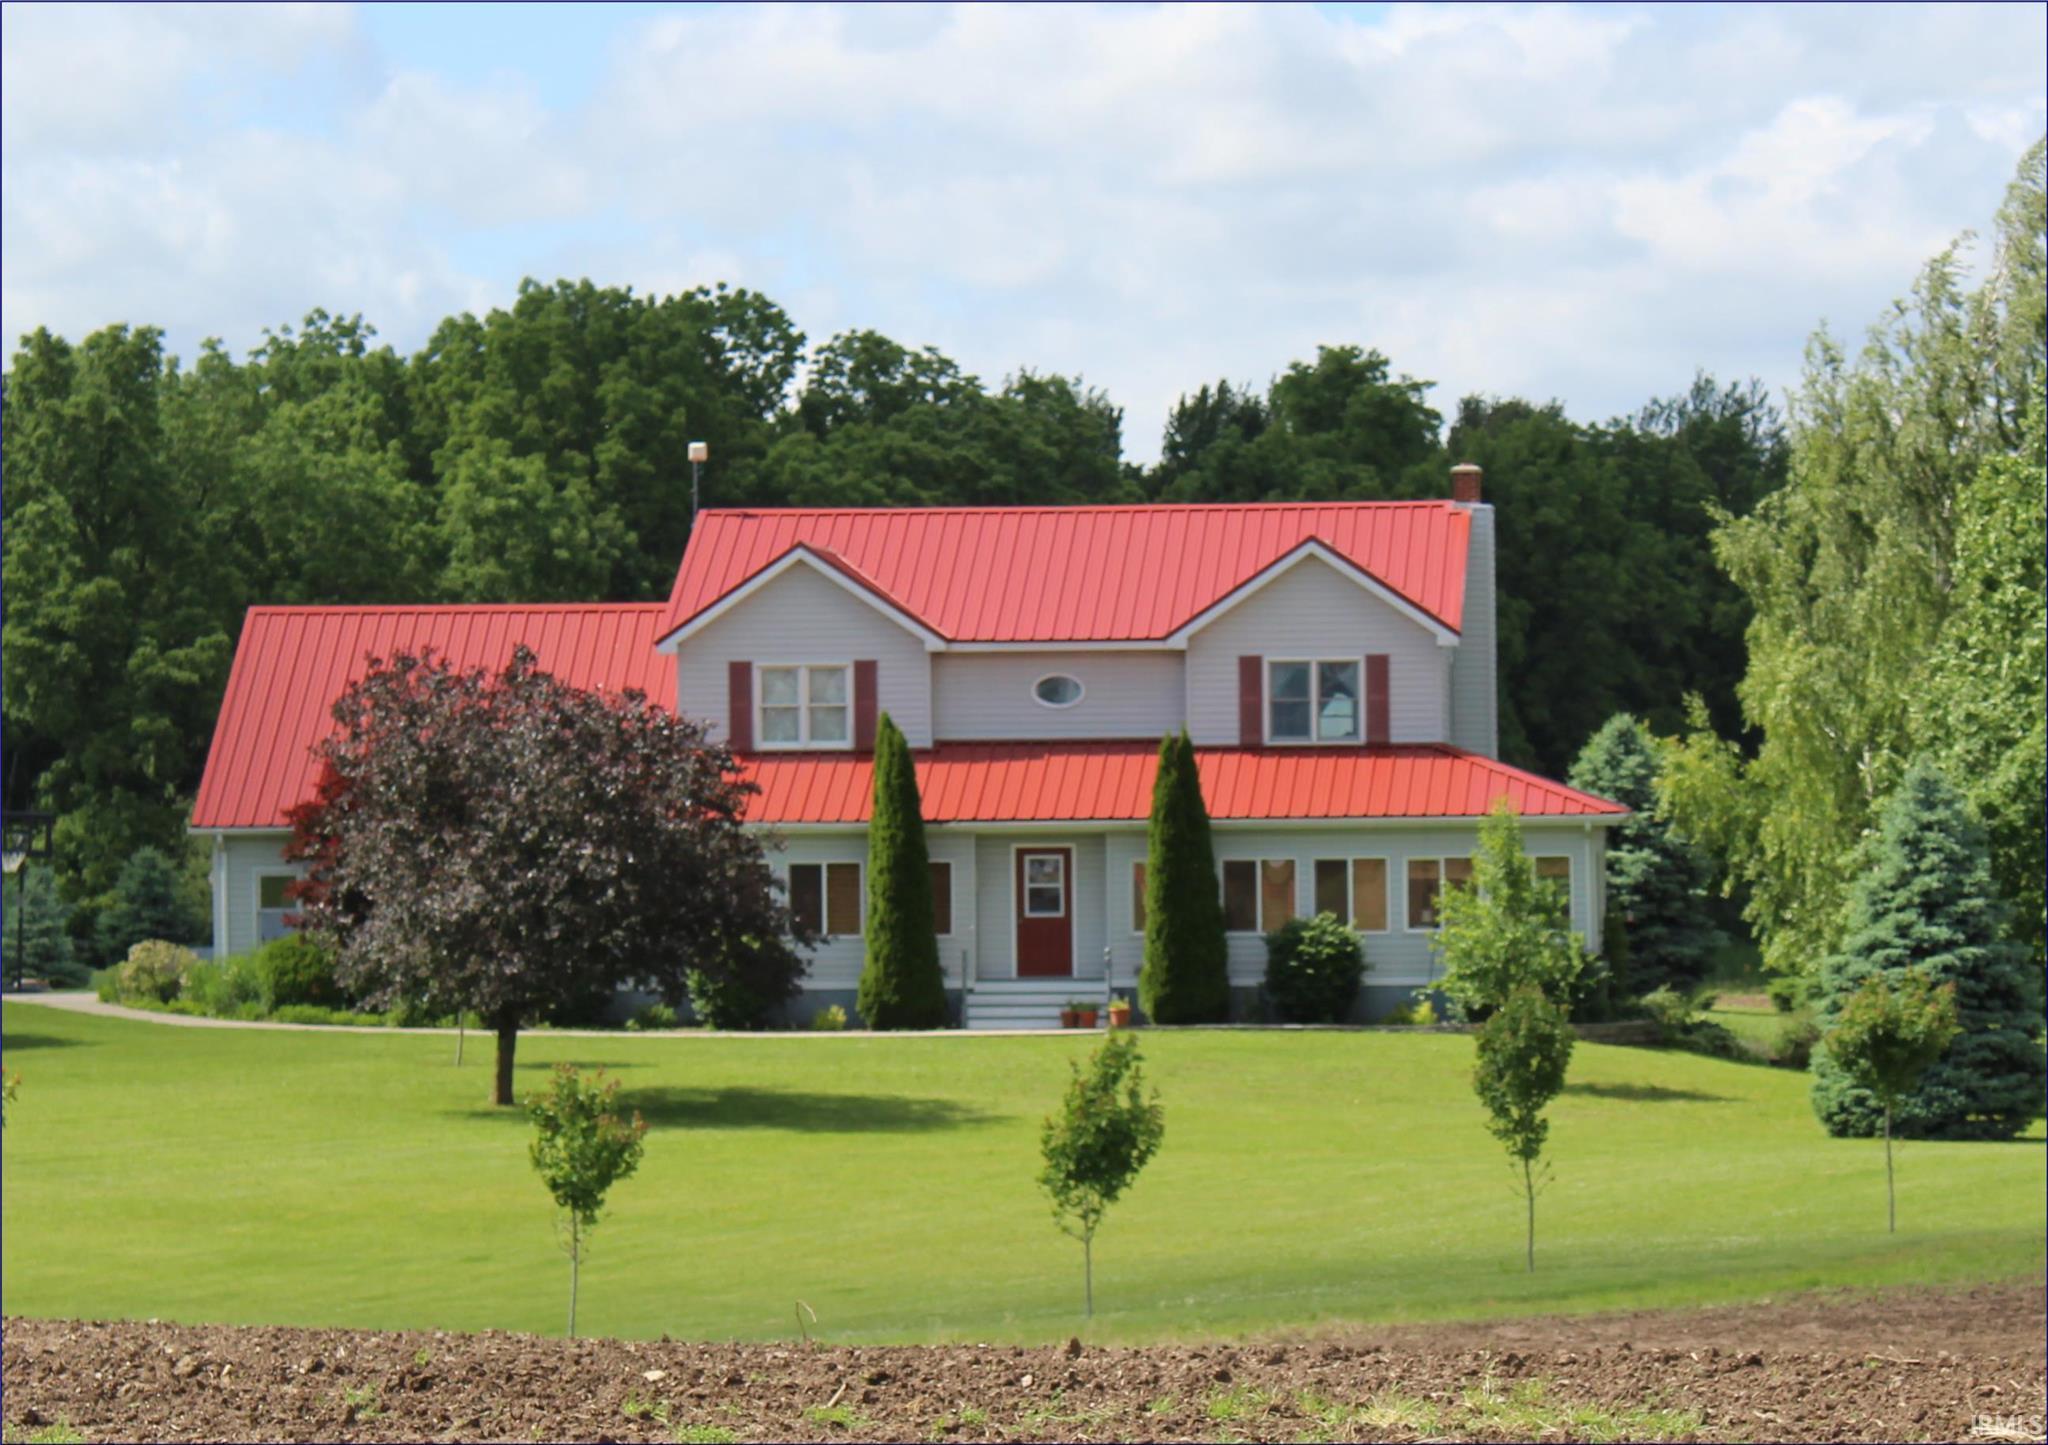 Search Angola Indiana Homes - MIKE THOMAS ASSOCIATES REALTORS®